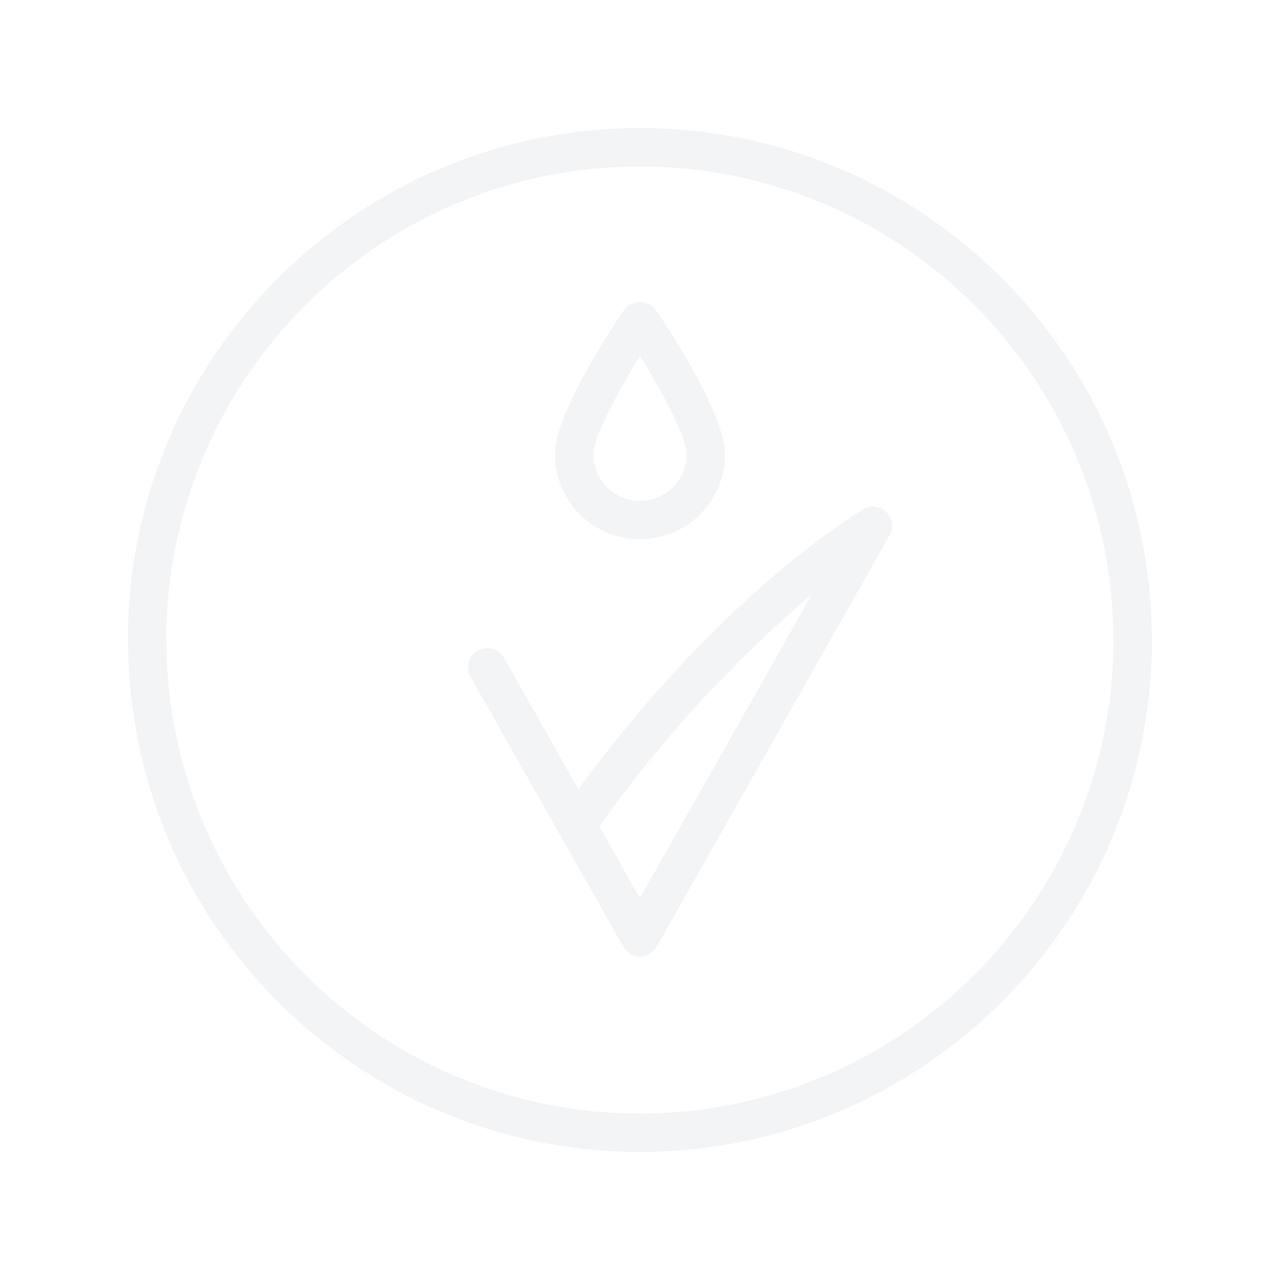 IDUN Minerals Eyebrow Pencil 1.2g